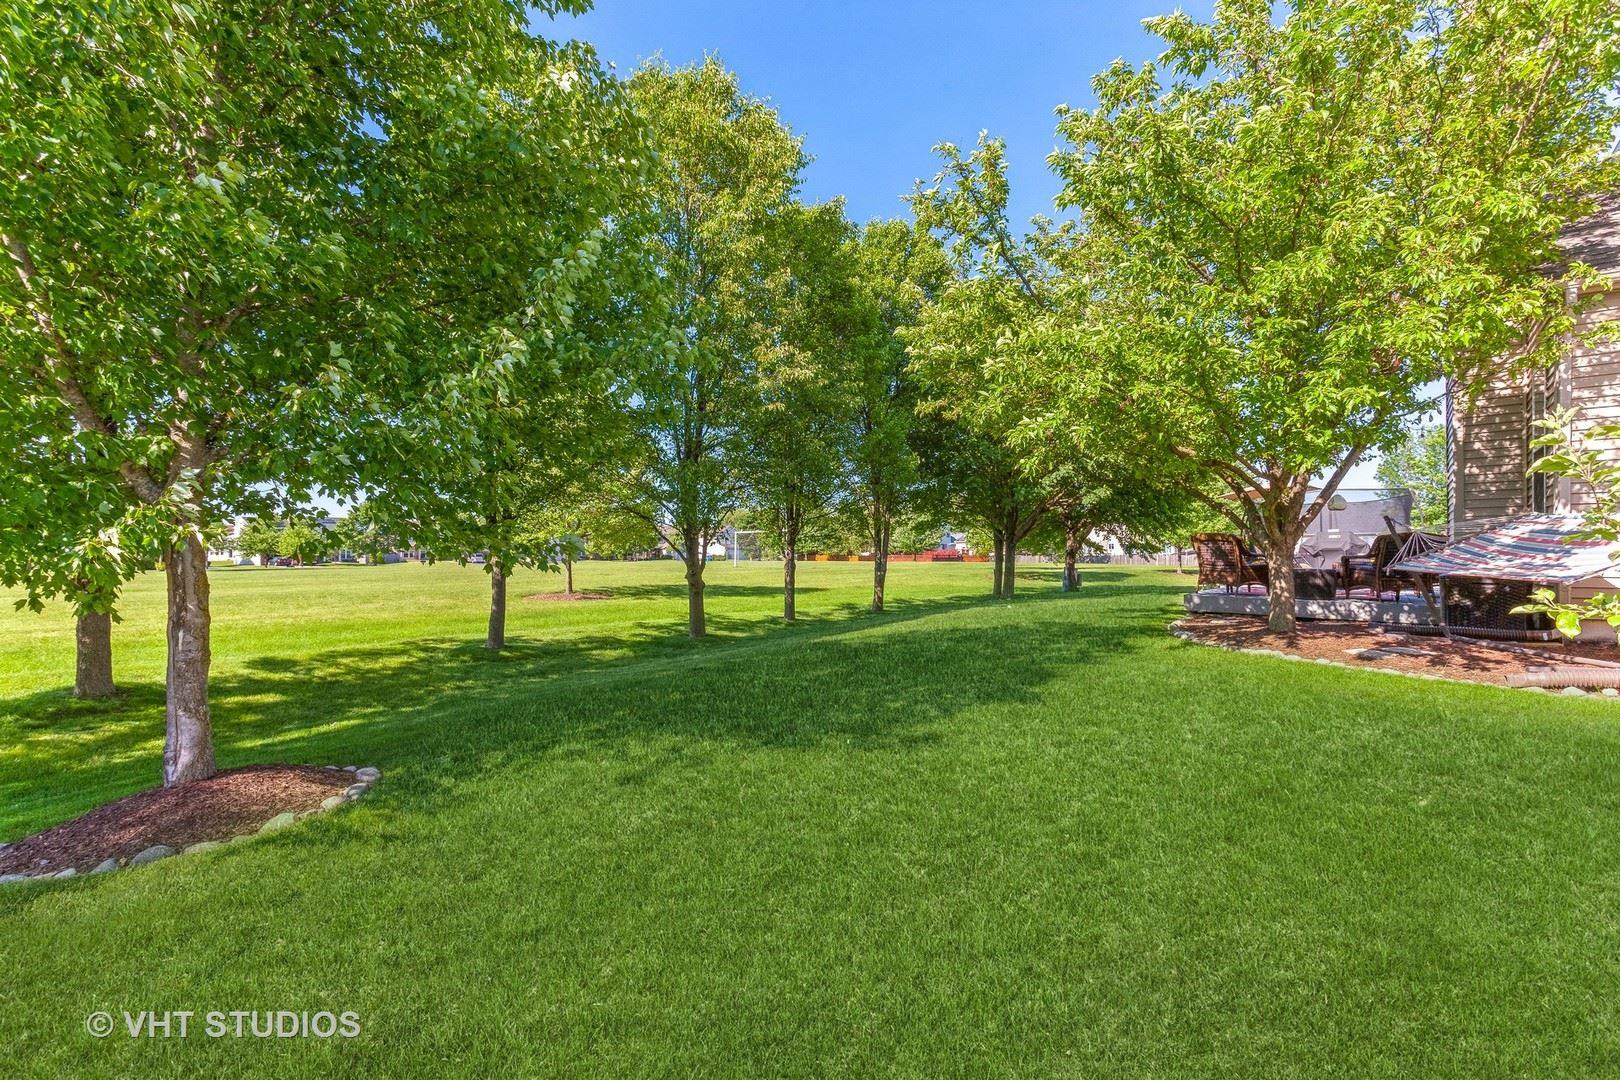 Photo of 3 Catalpa Court, Bolingbrook, IL 60490 (MLS # 11129525)